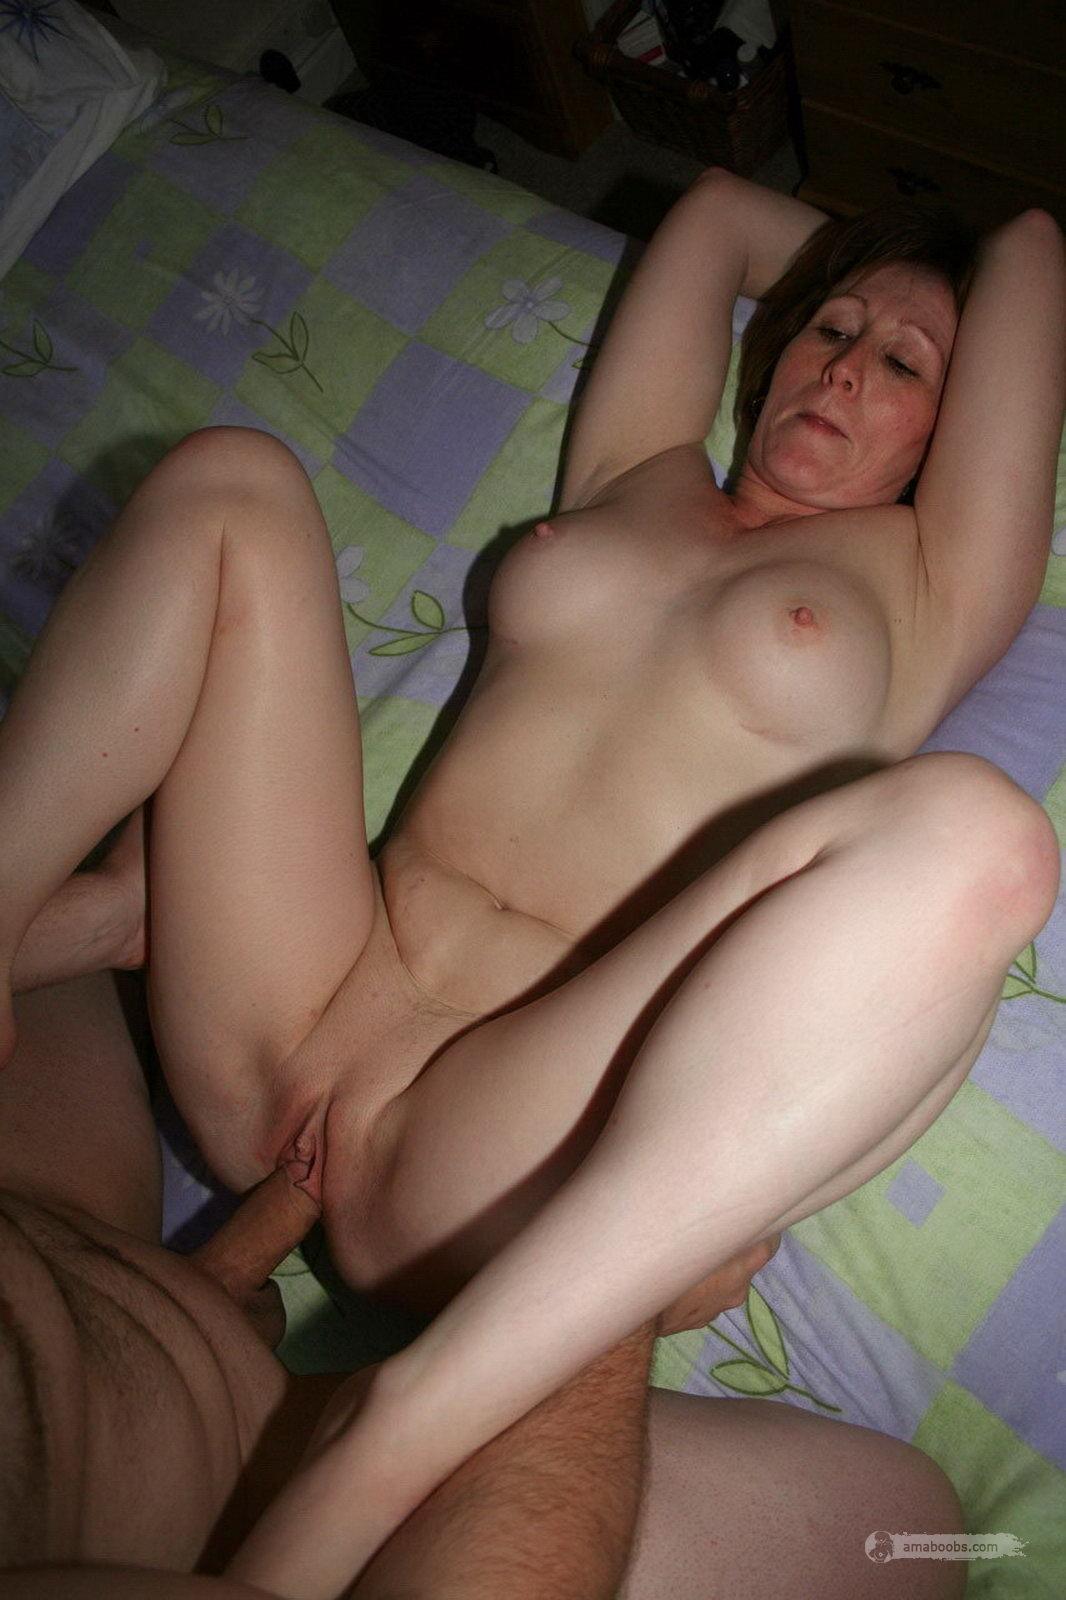 First Latvian Fusker Amaboobscom24-Mature-Mom-Porn-Pics -1118